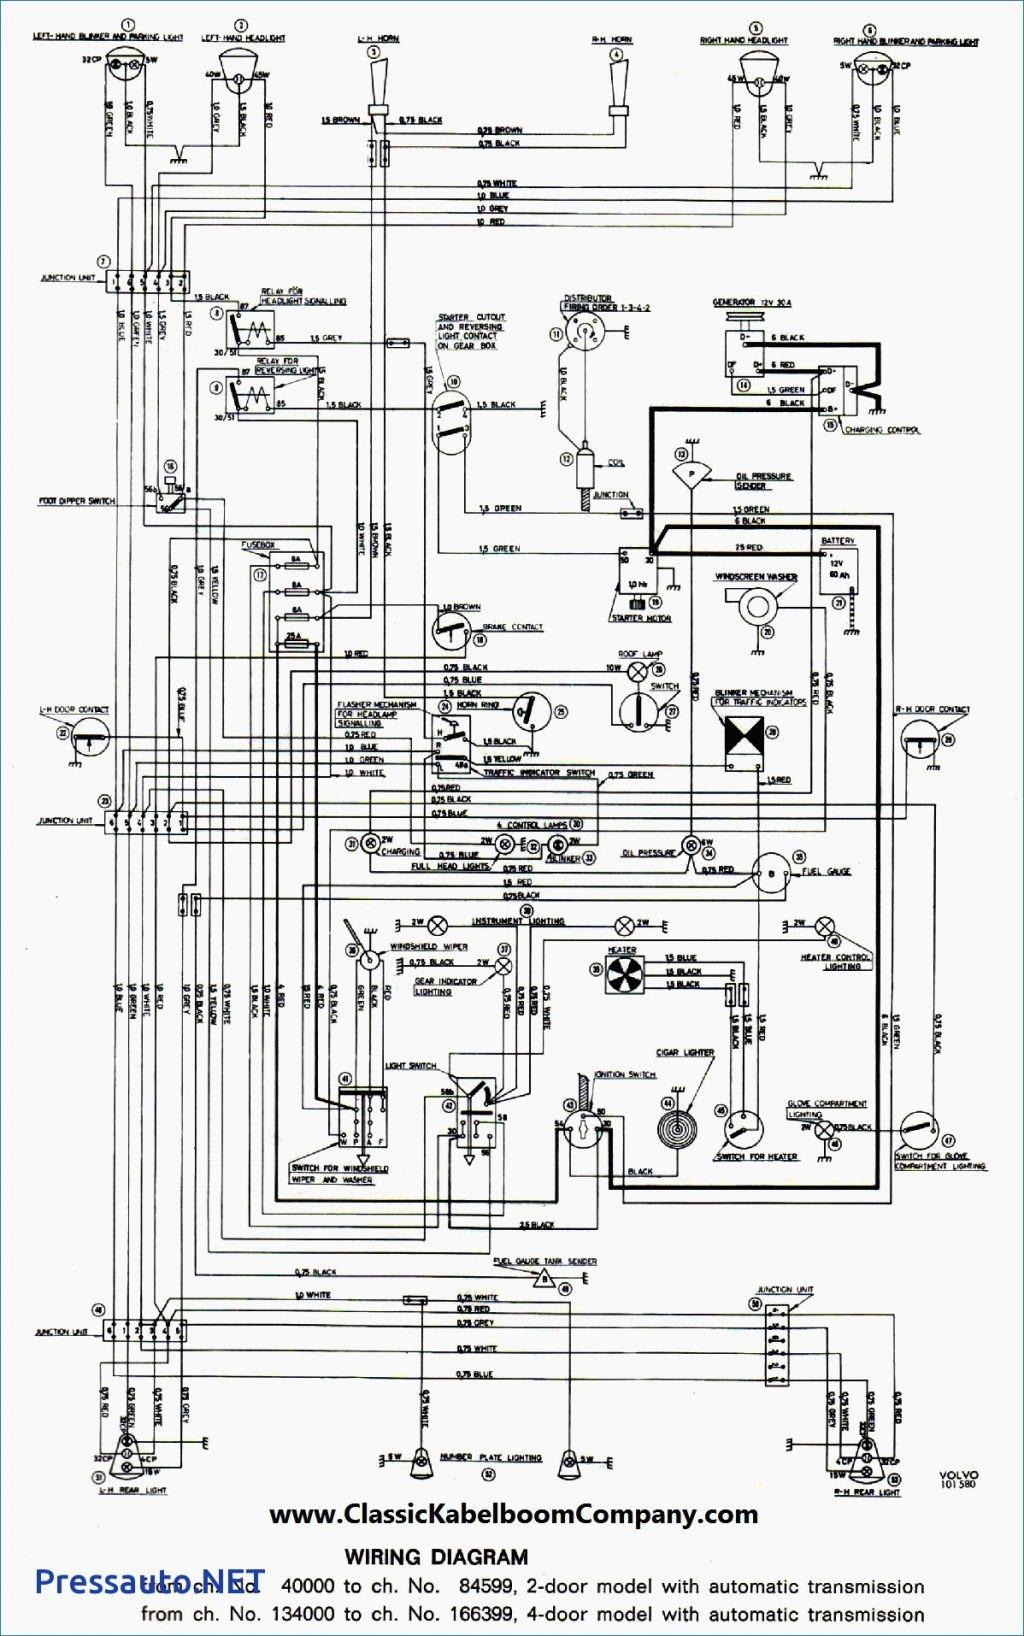 Asco Transfer Switch Wiring Diagram